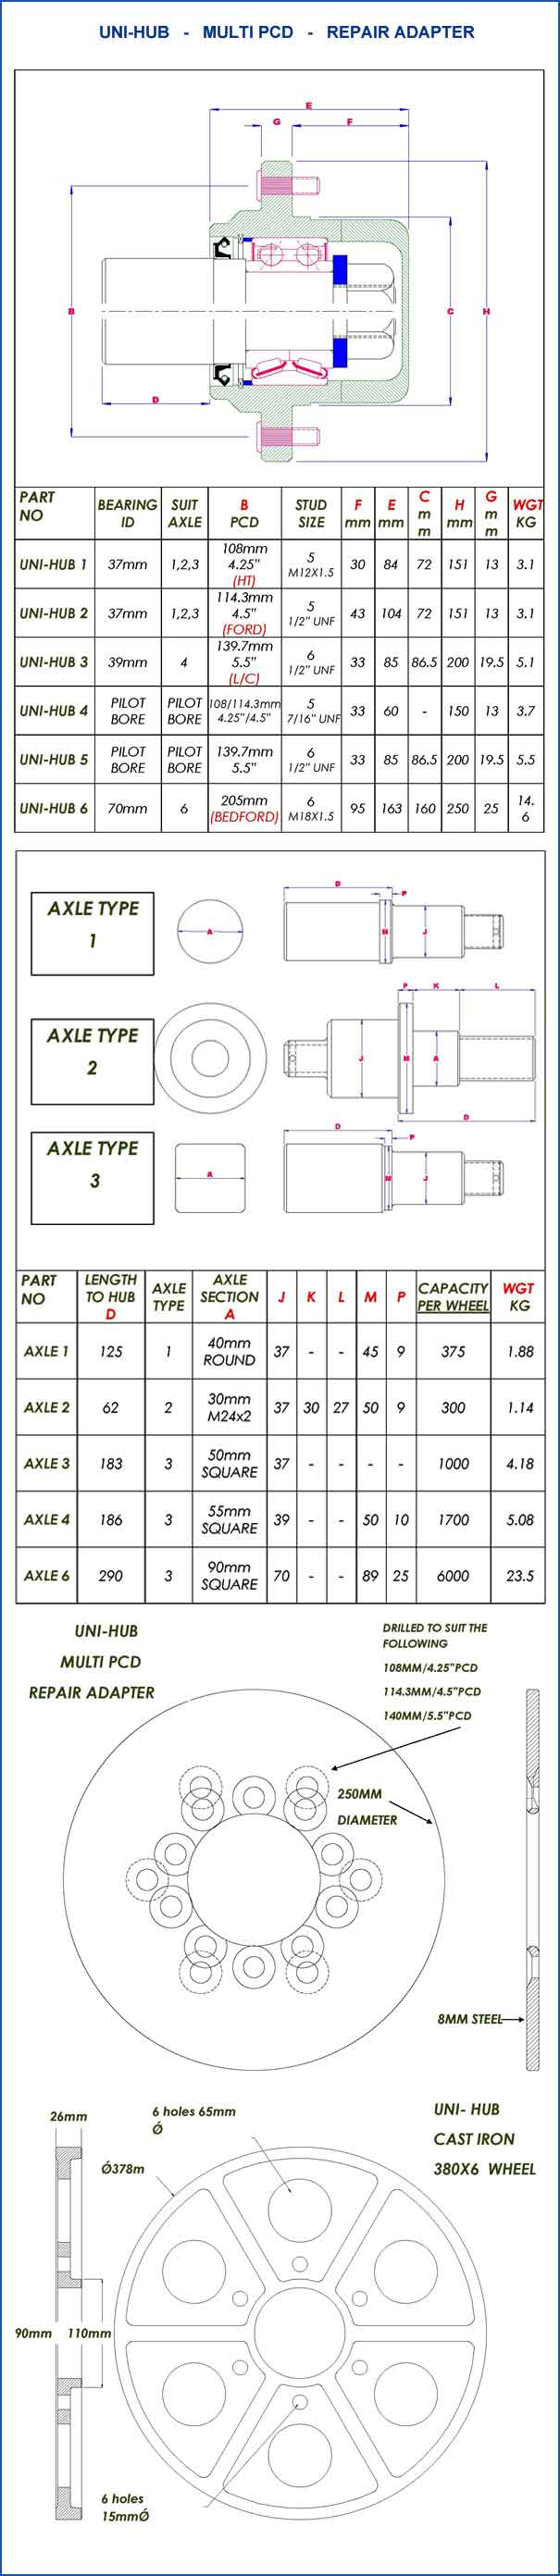 uni-hub multi pcd repair adapter parts list